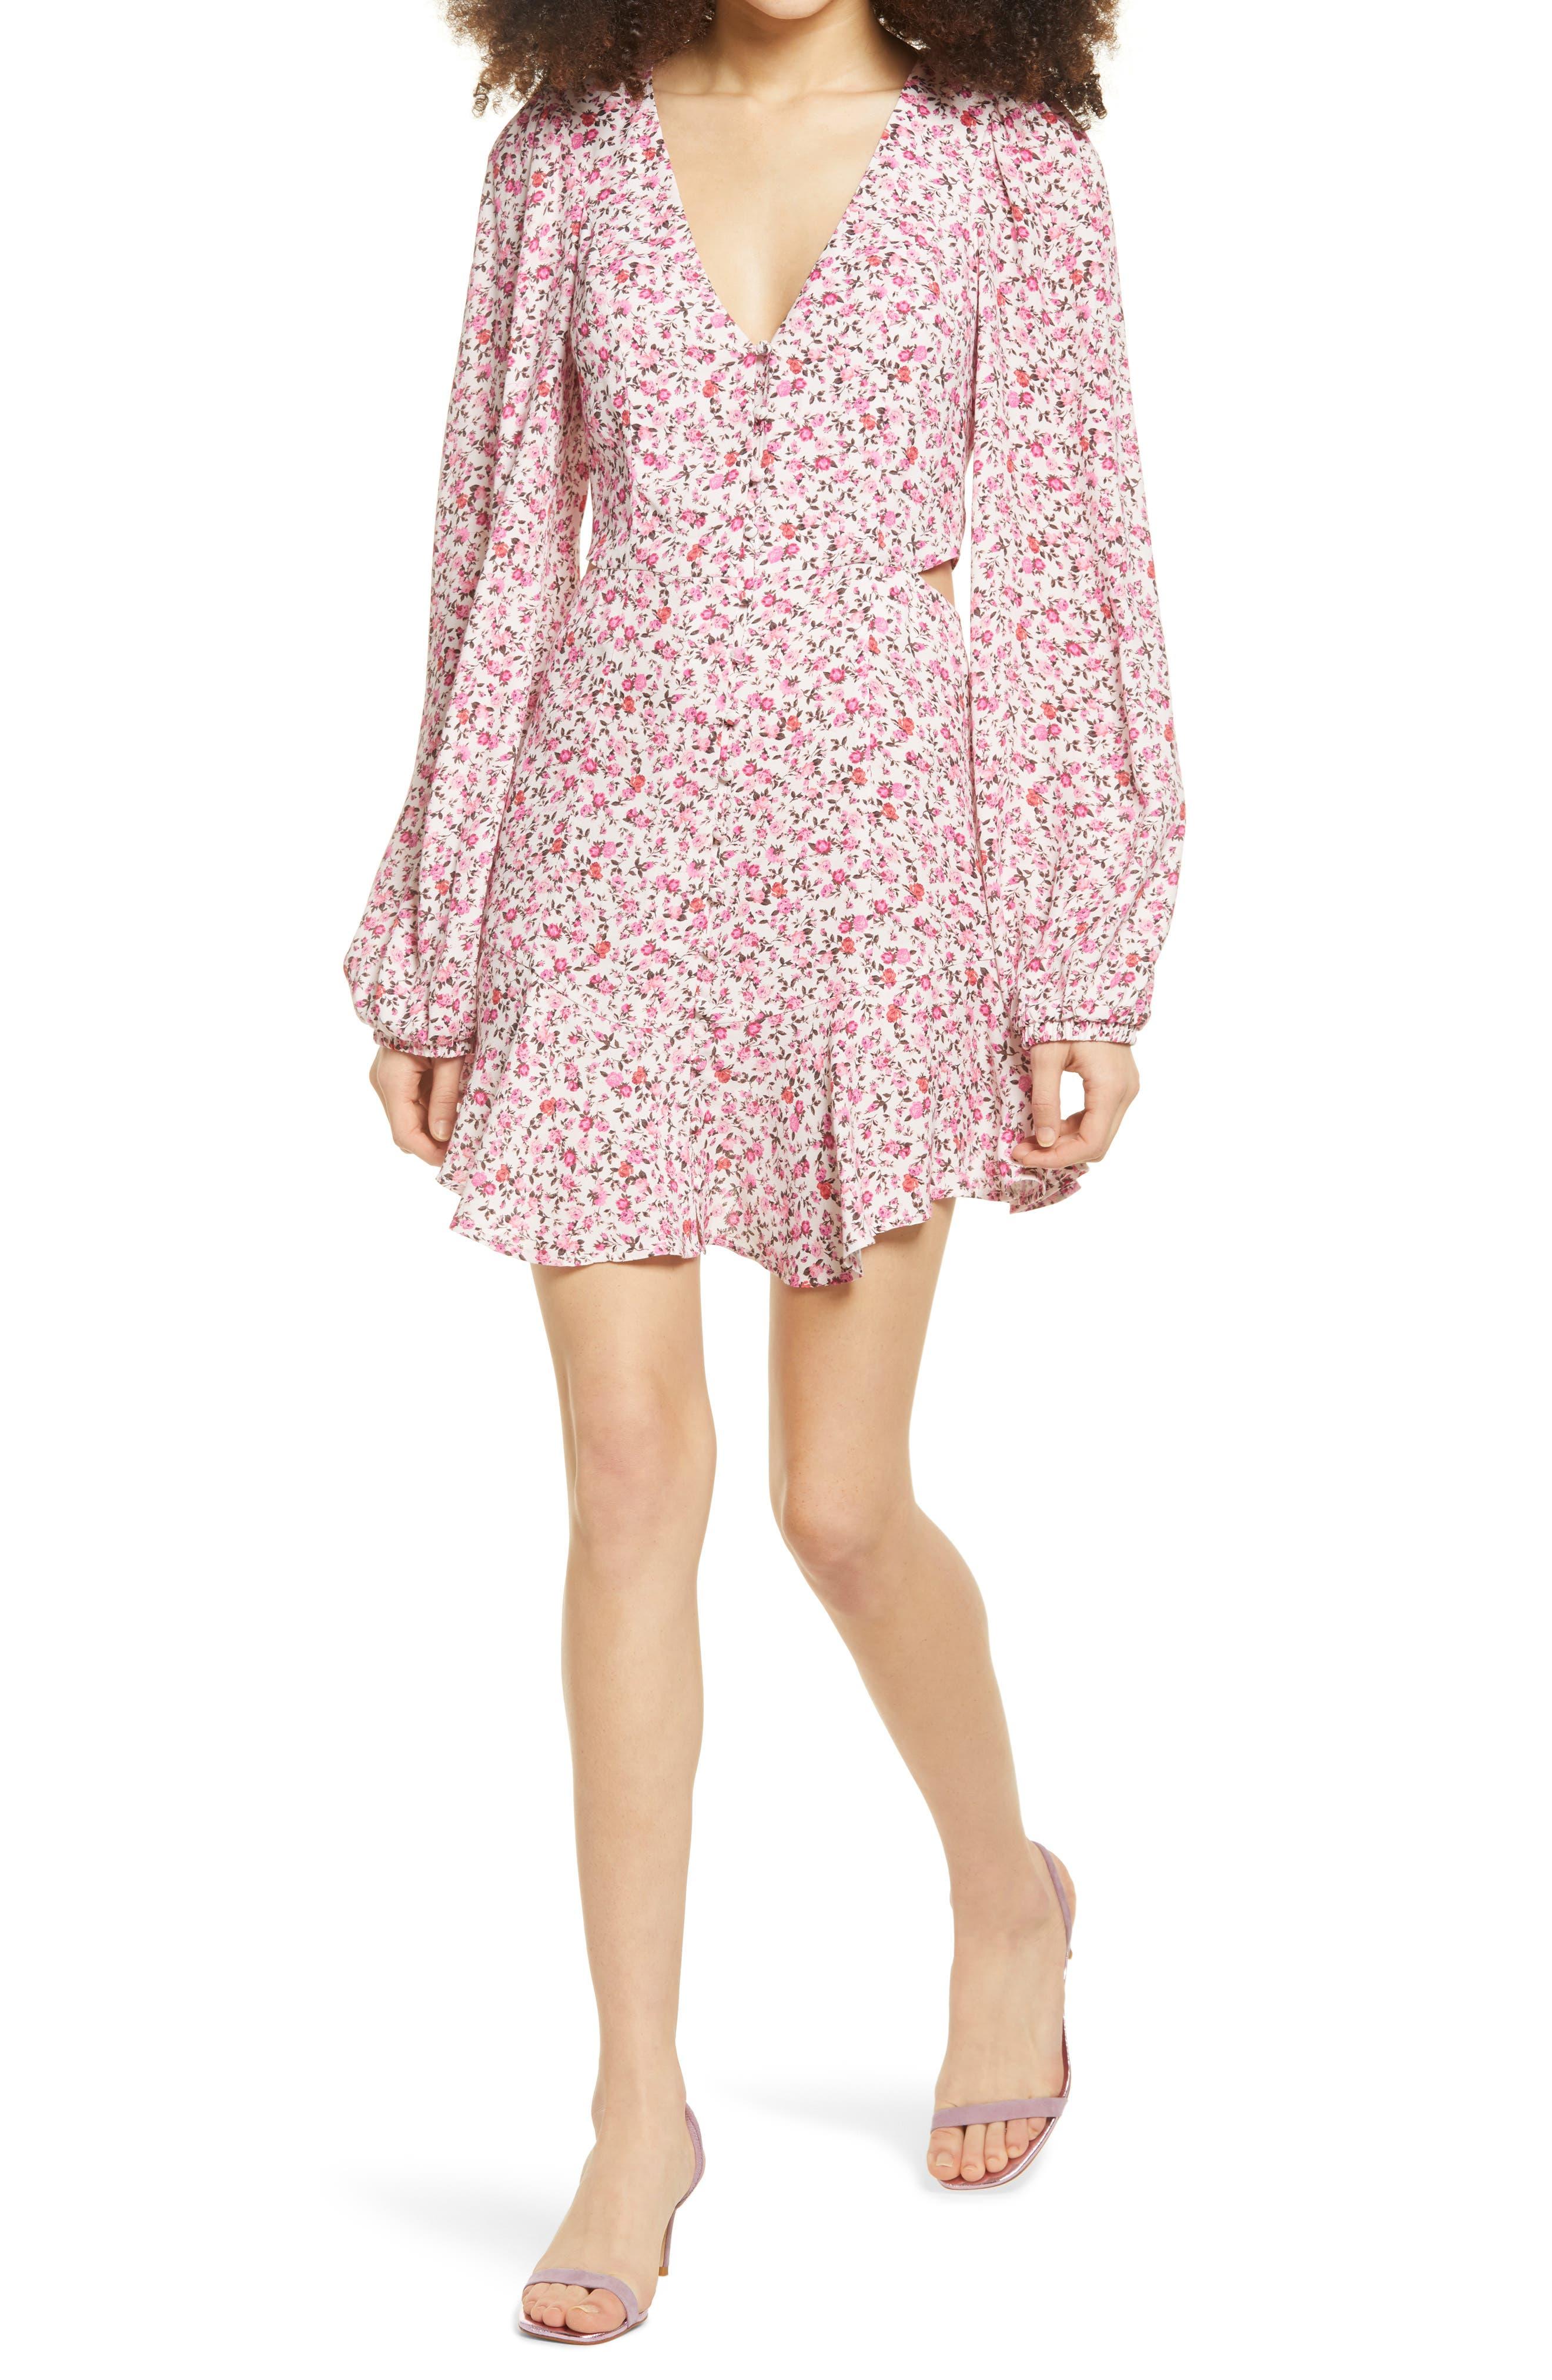 Monna Side Cutout Long Sleeve Minidress